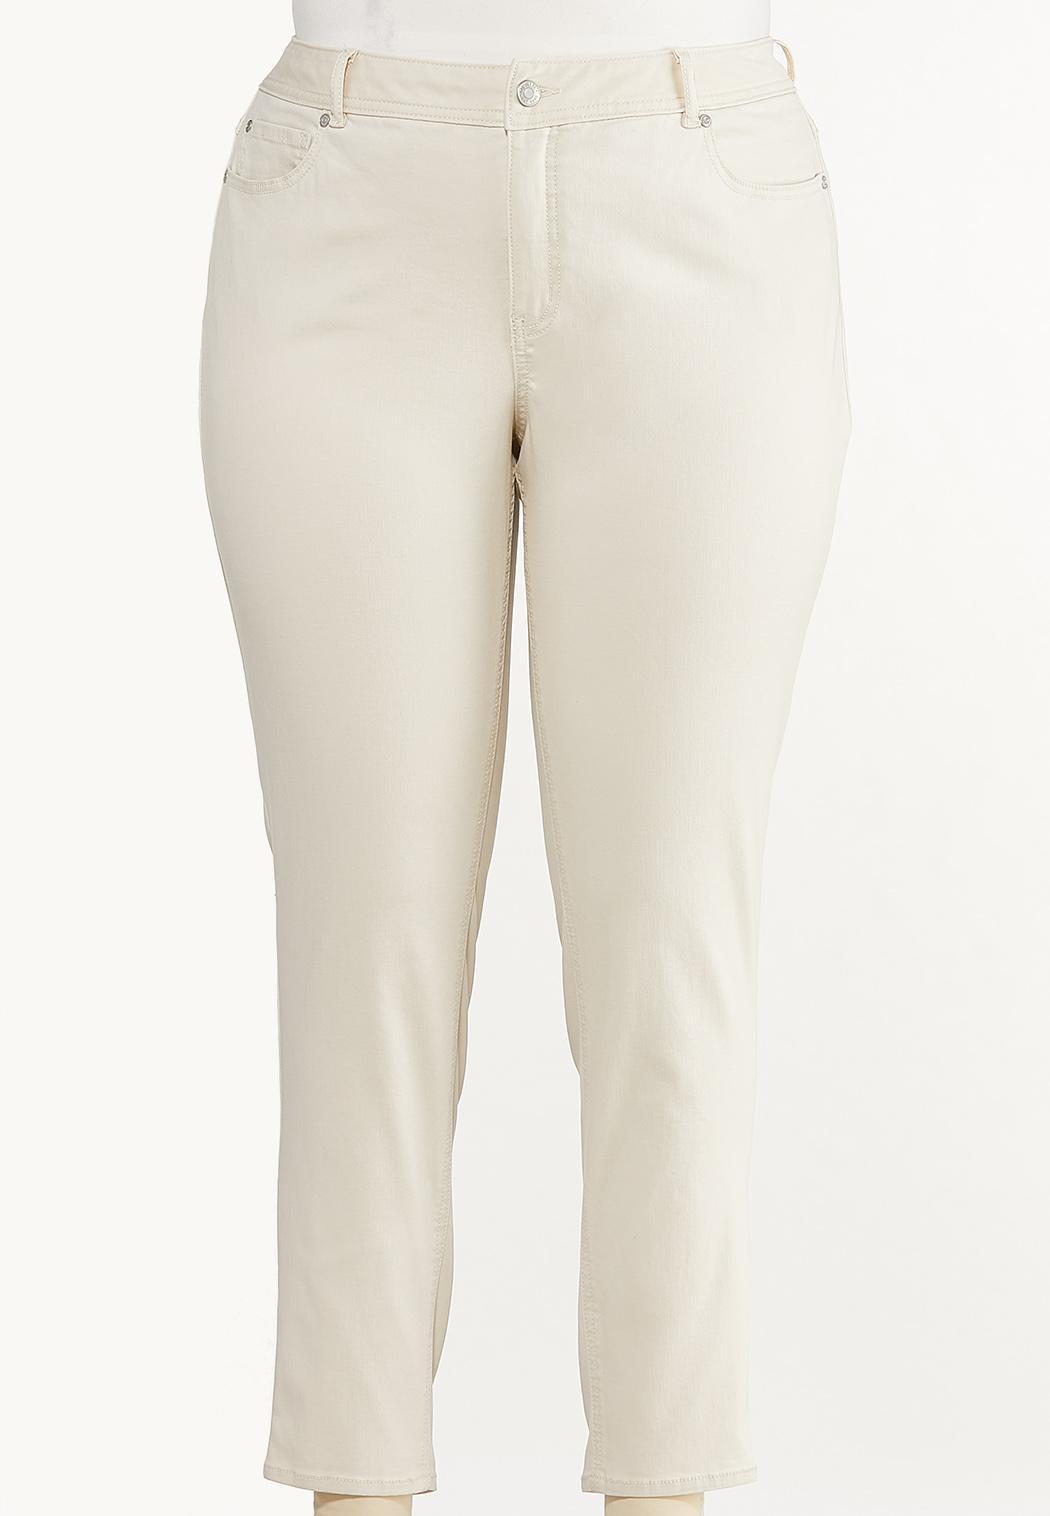 Plus Size Neutral Skinny Jeans